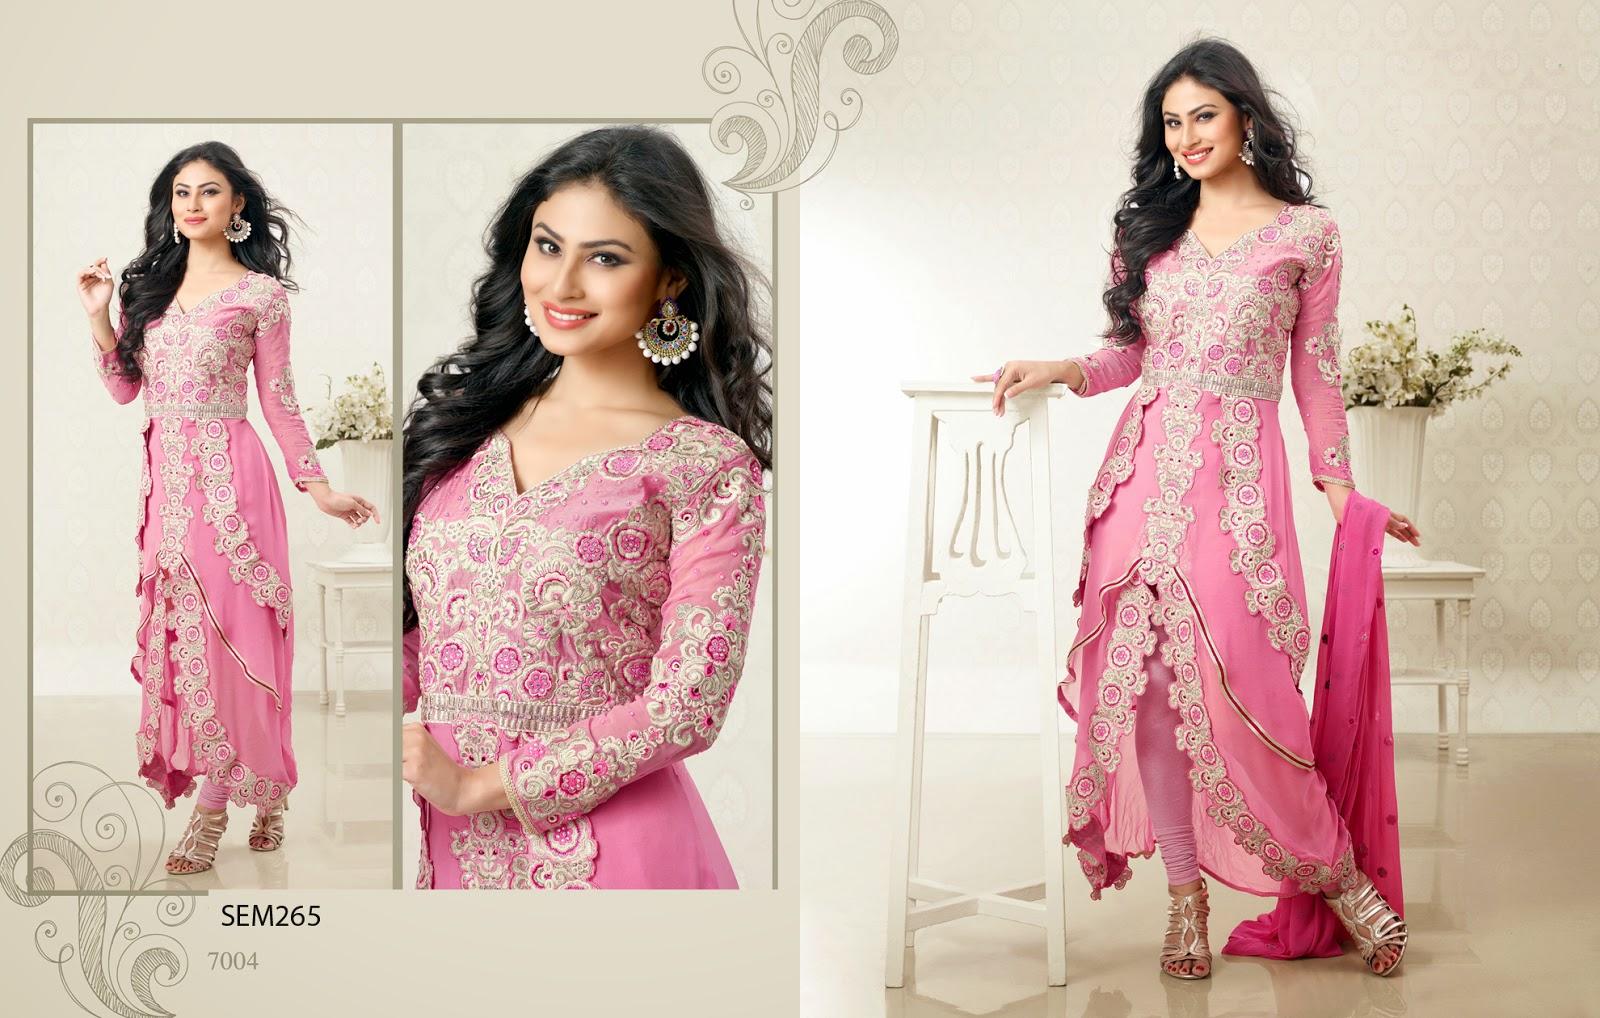 Latest Style of Long Floor Length Frocks Anarkali Suit   Helix ...